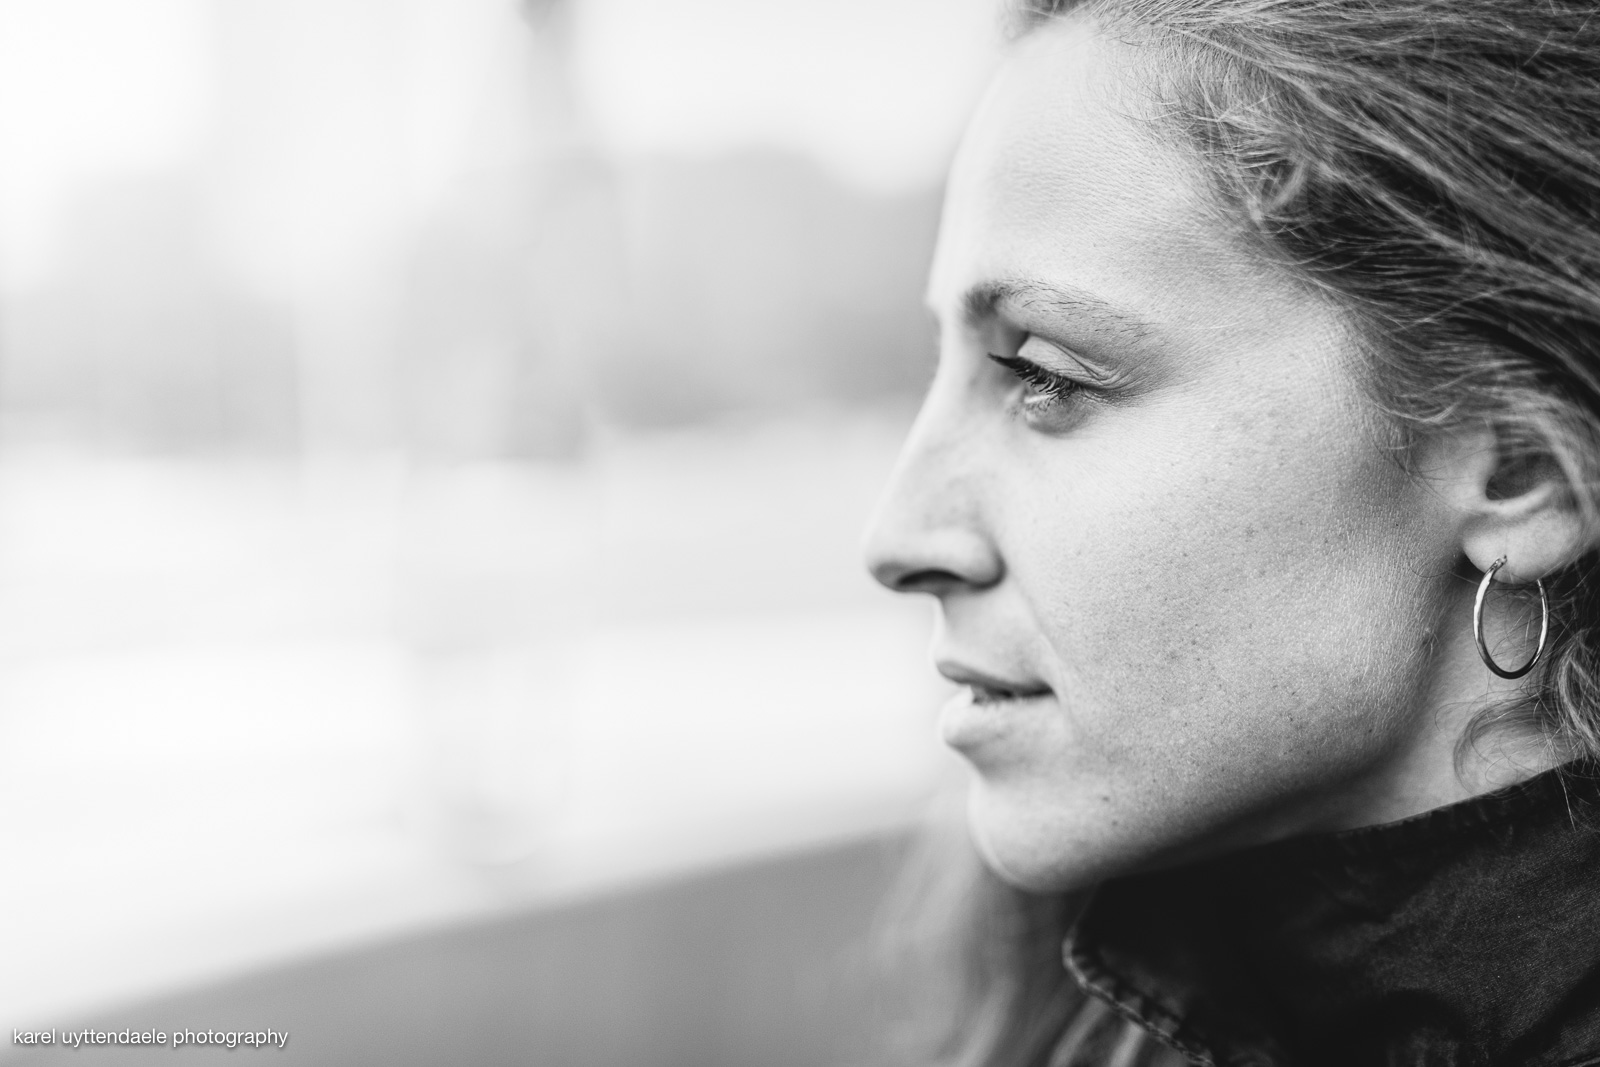 Laura Groeseneken (Sennek)